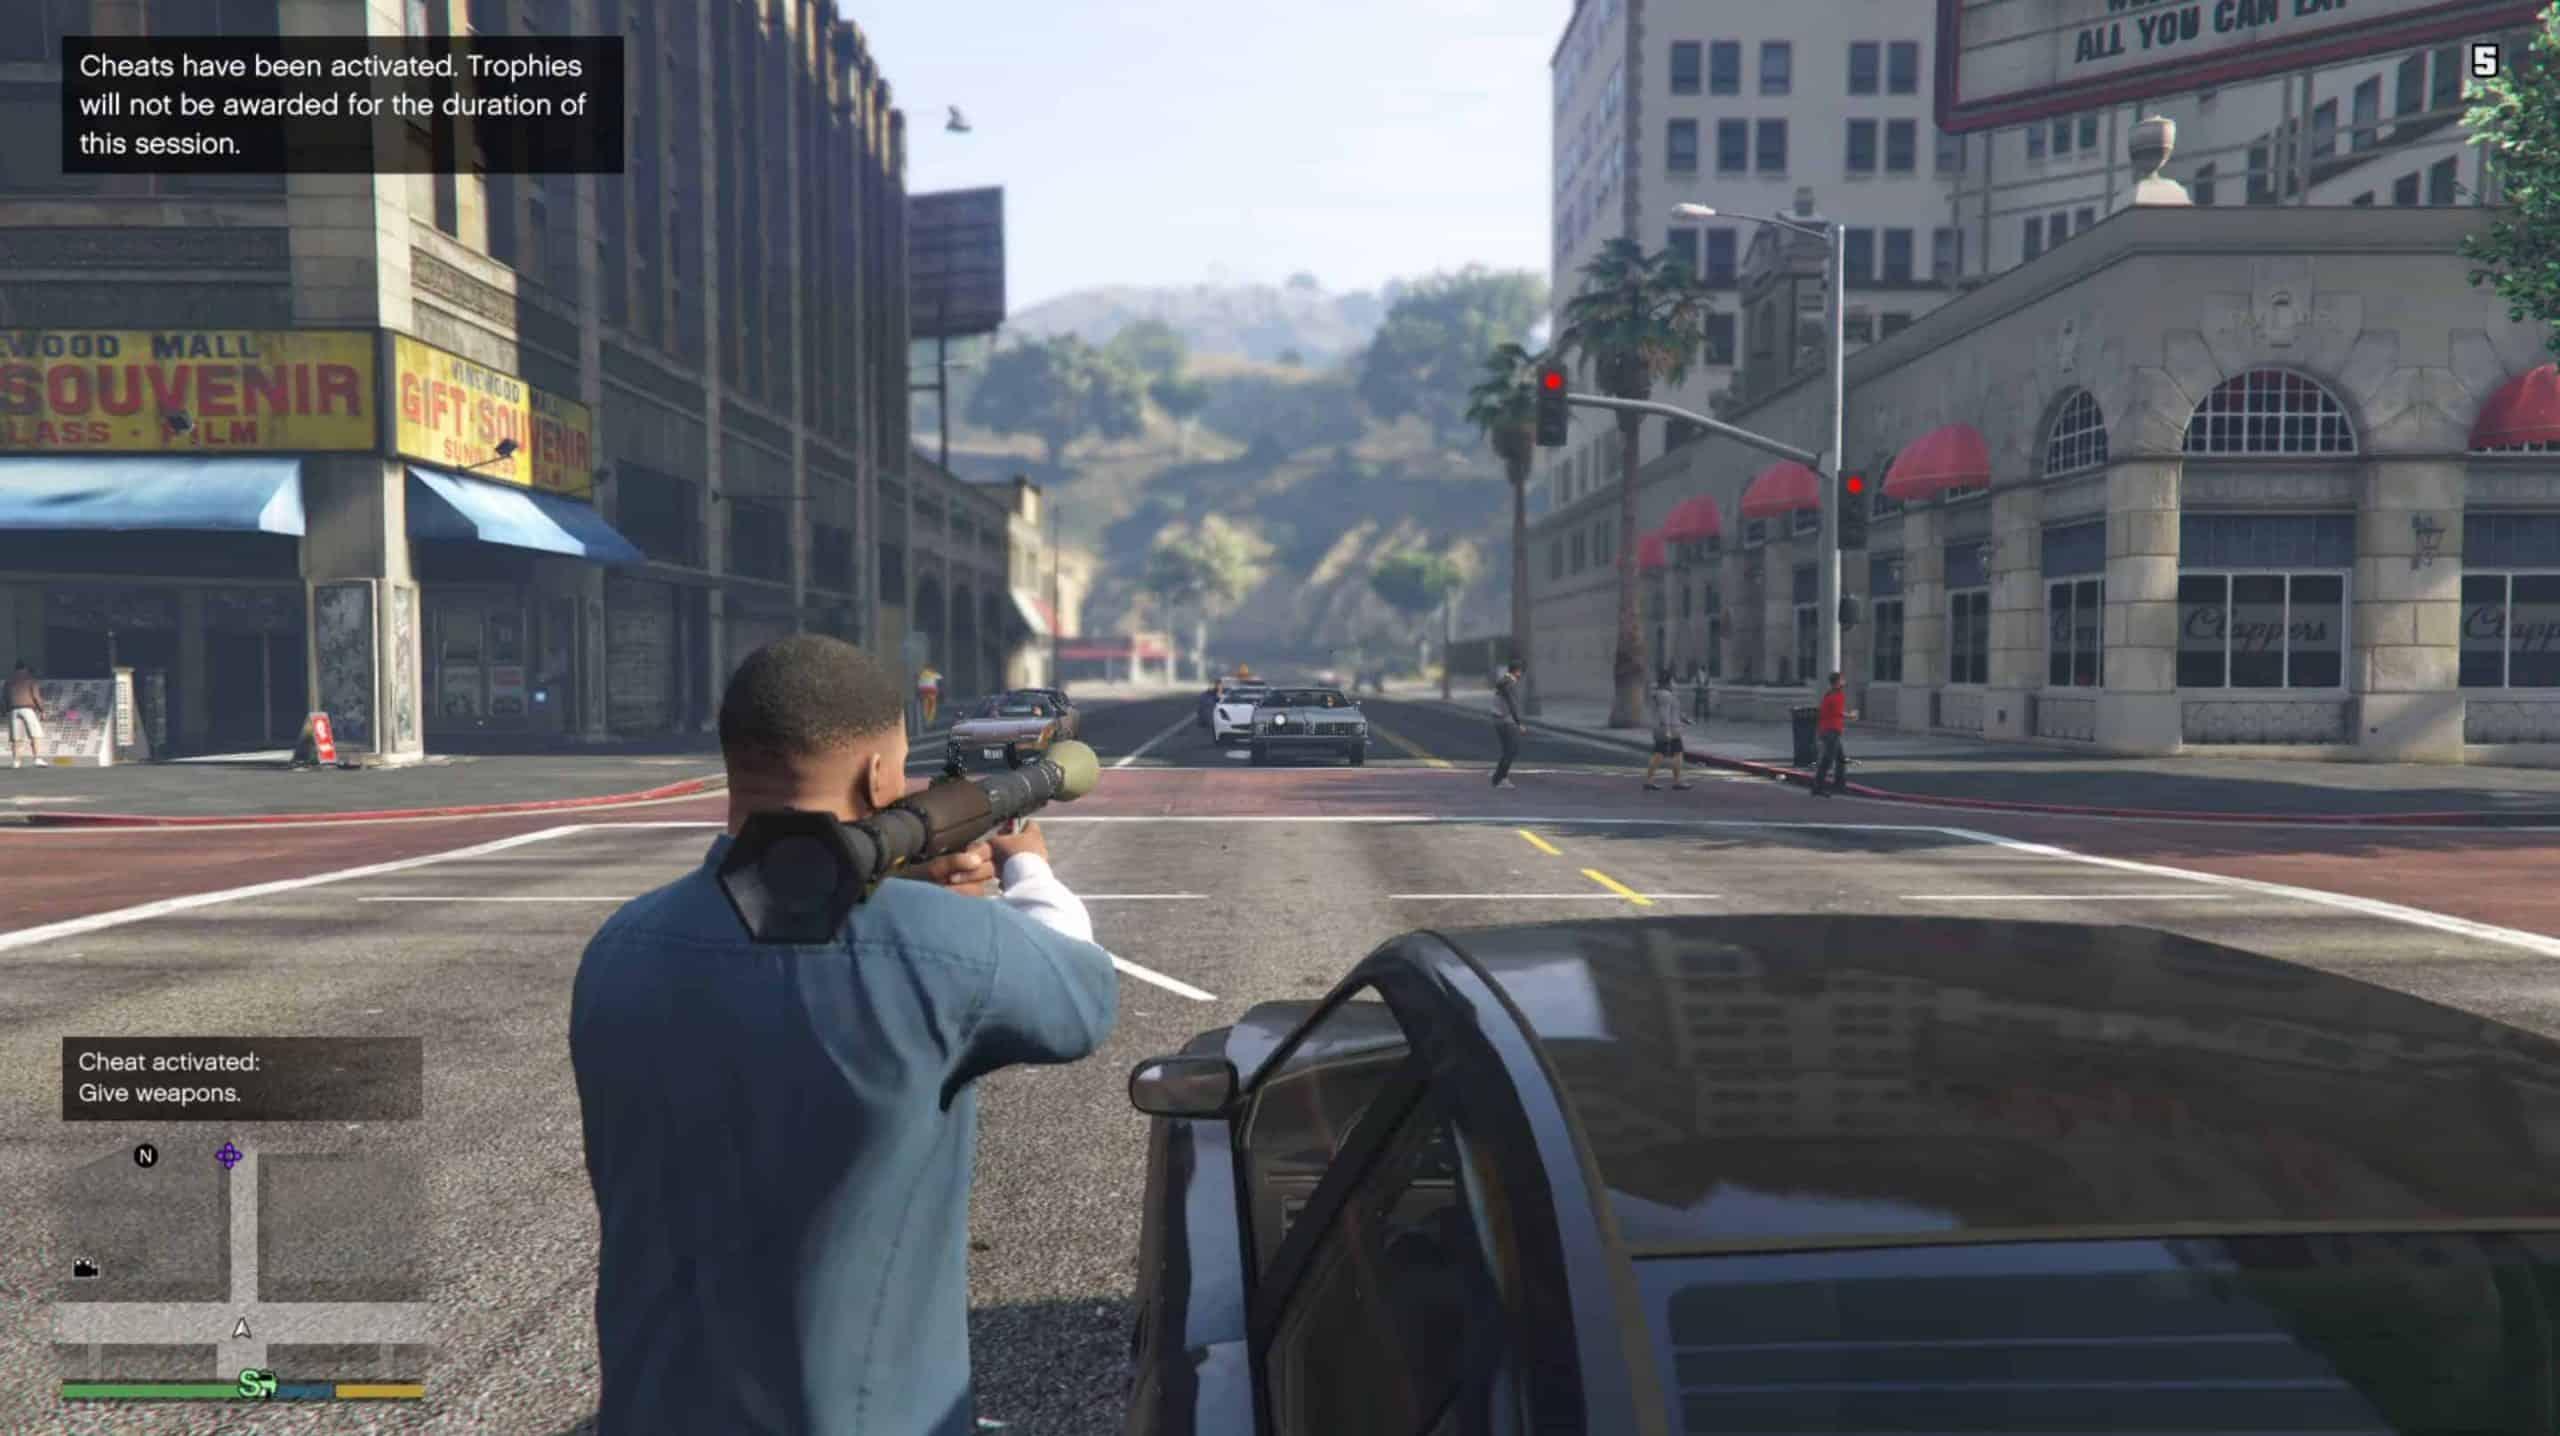 Cara-Cheat-Grand-Theft-Auto-5-scaled